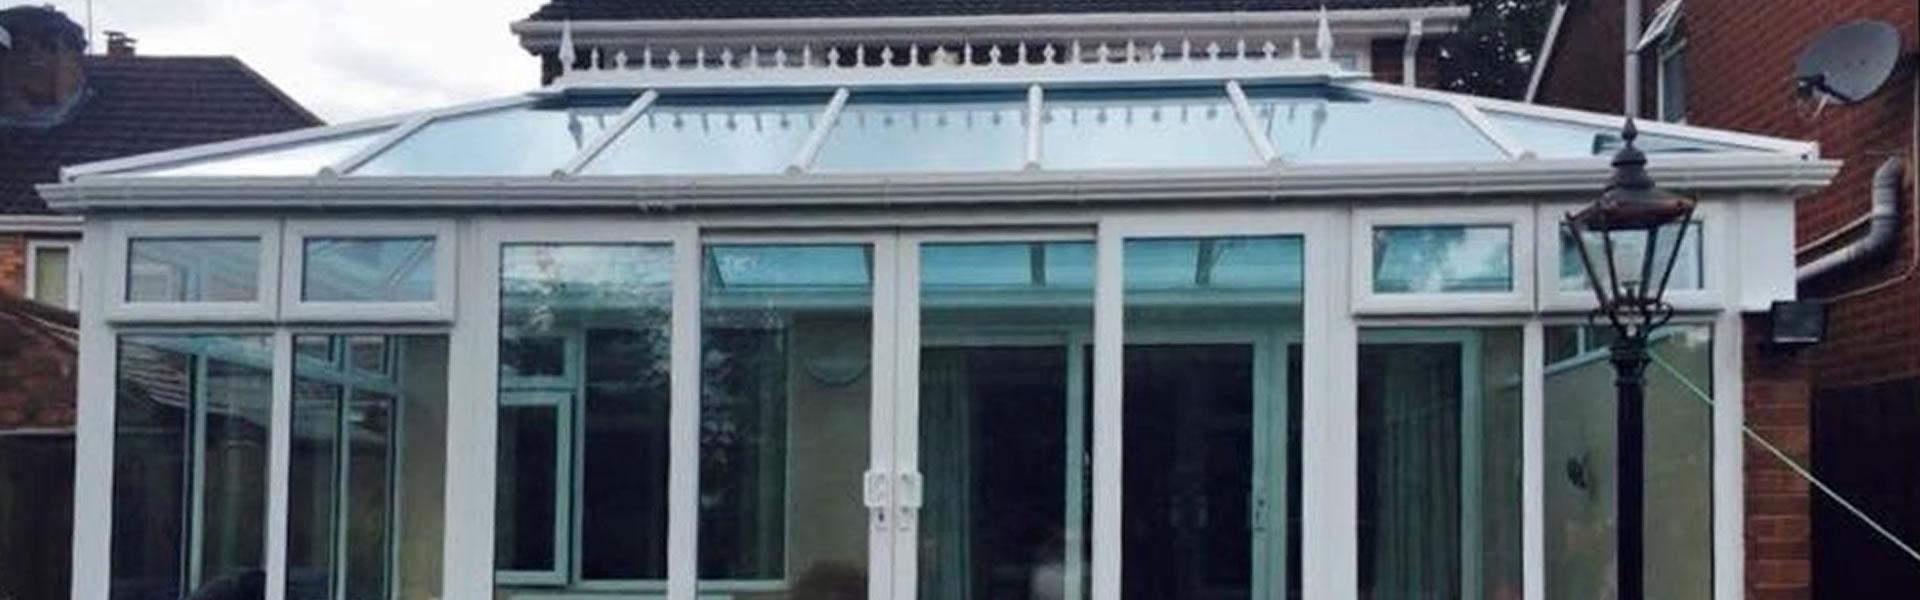 Conservatory Orangeries Builder Wednesbury Walsall